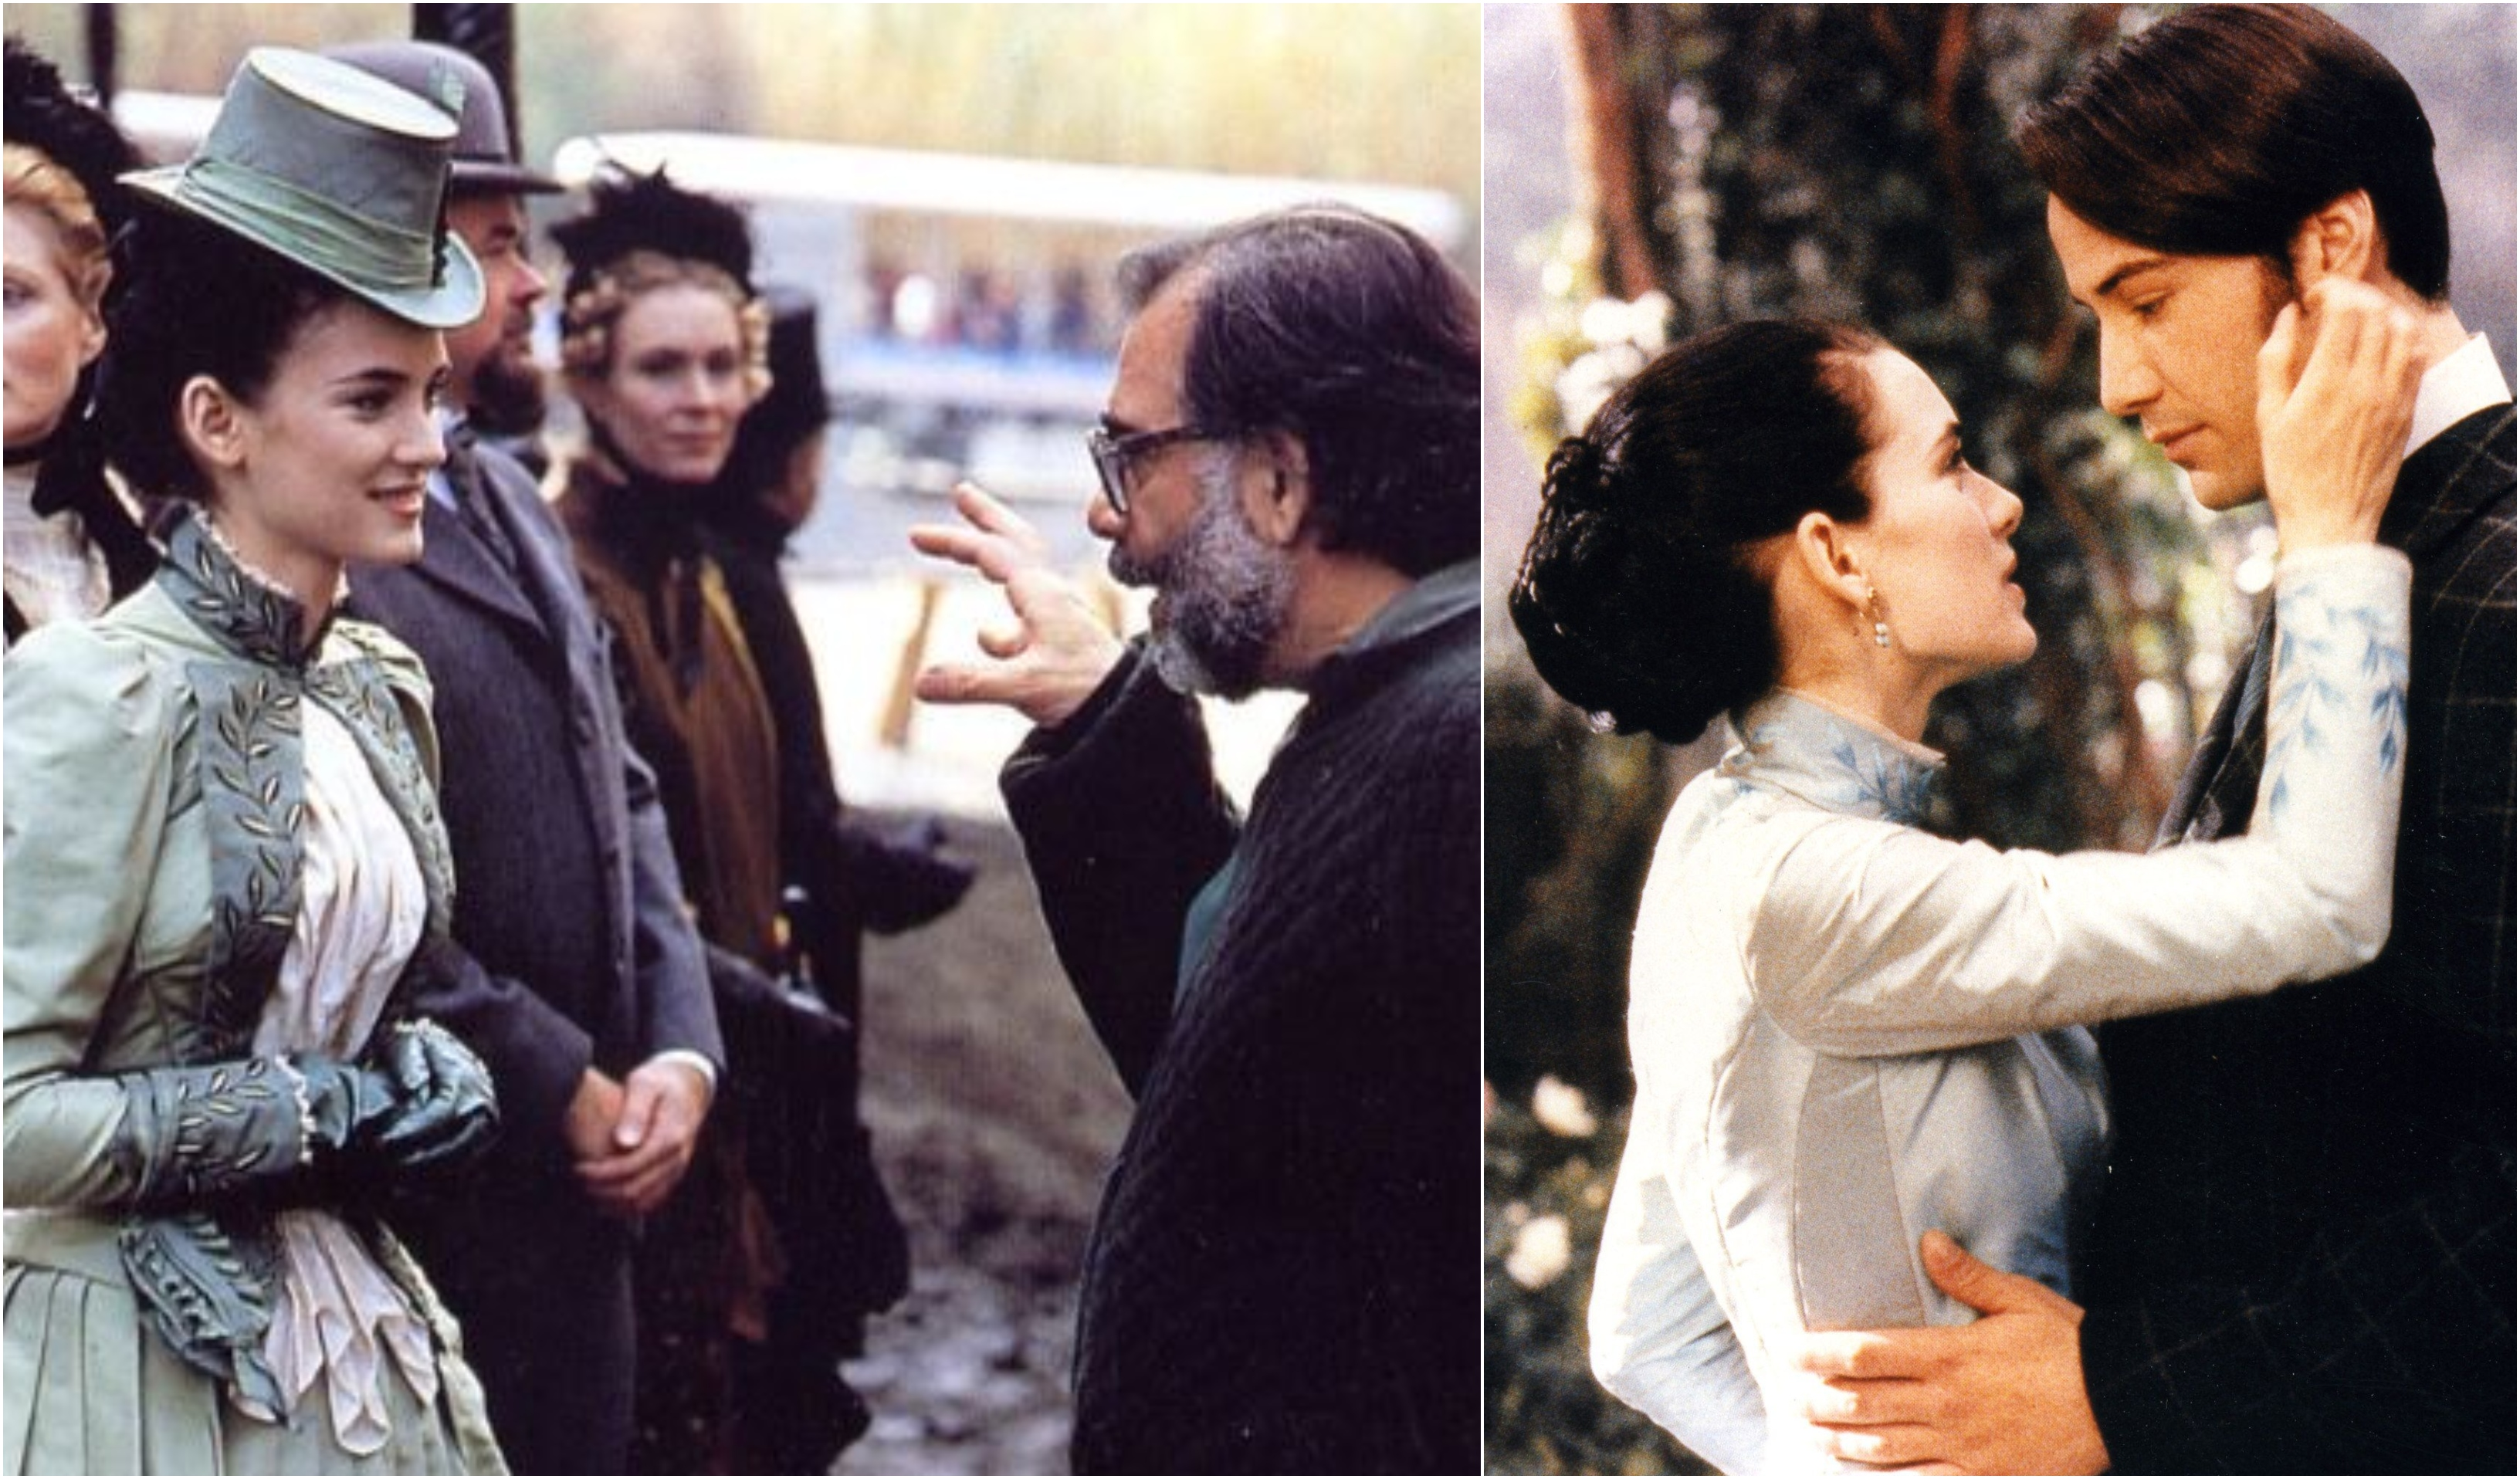 Dracula, Coppola urlava 'putt**a' a Winona Ryder per farla piangere, Reeves e Hopkins si rifiutarono